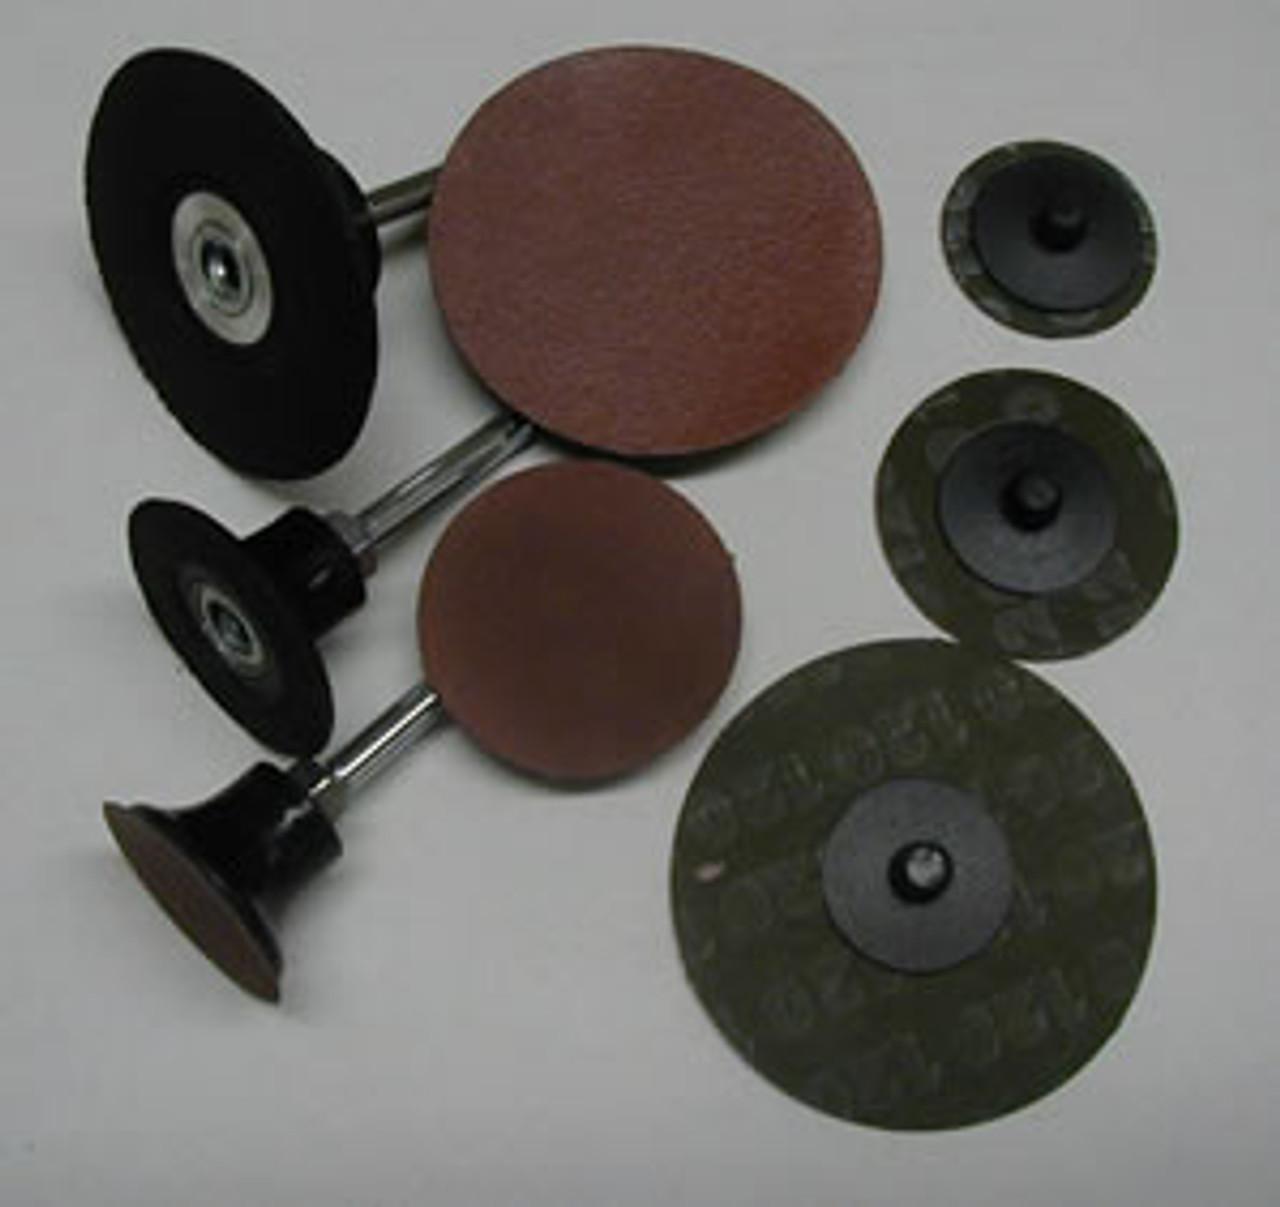 "Aluminum Oxide Sanding Disk 2"" - 24 Grit"